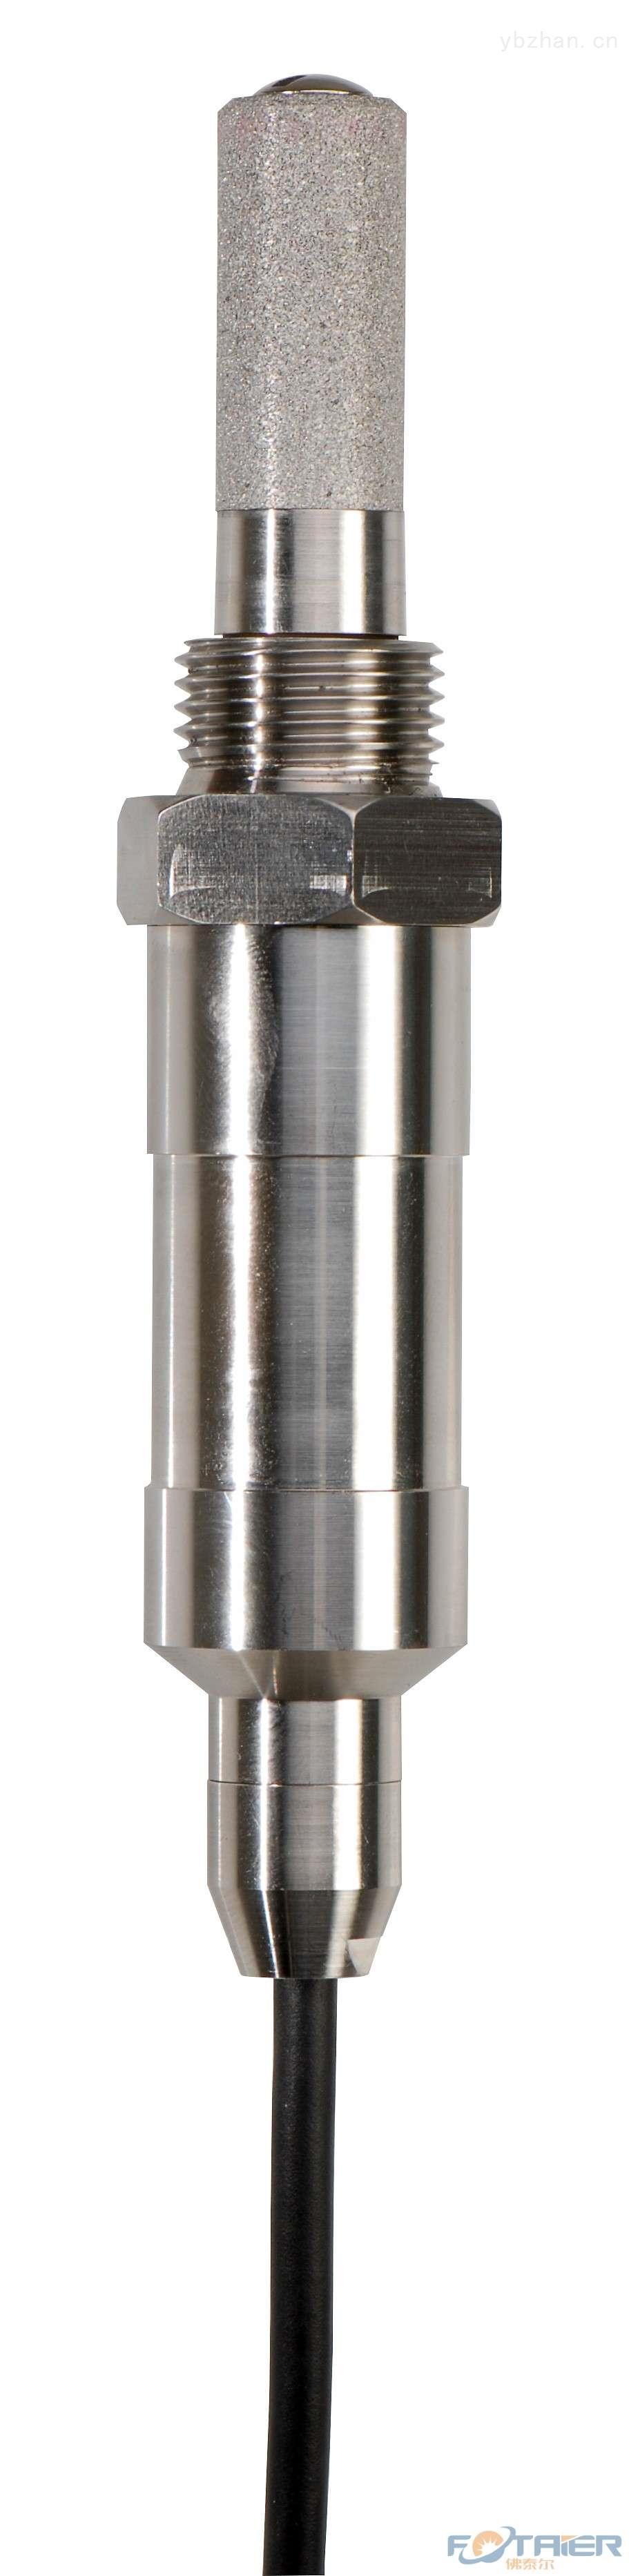 HC2-LDP-瑞士罗卓尼克超低温露点仪传感器